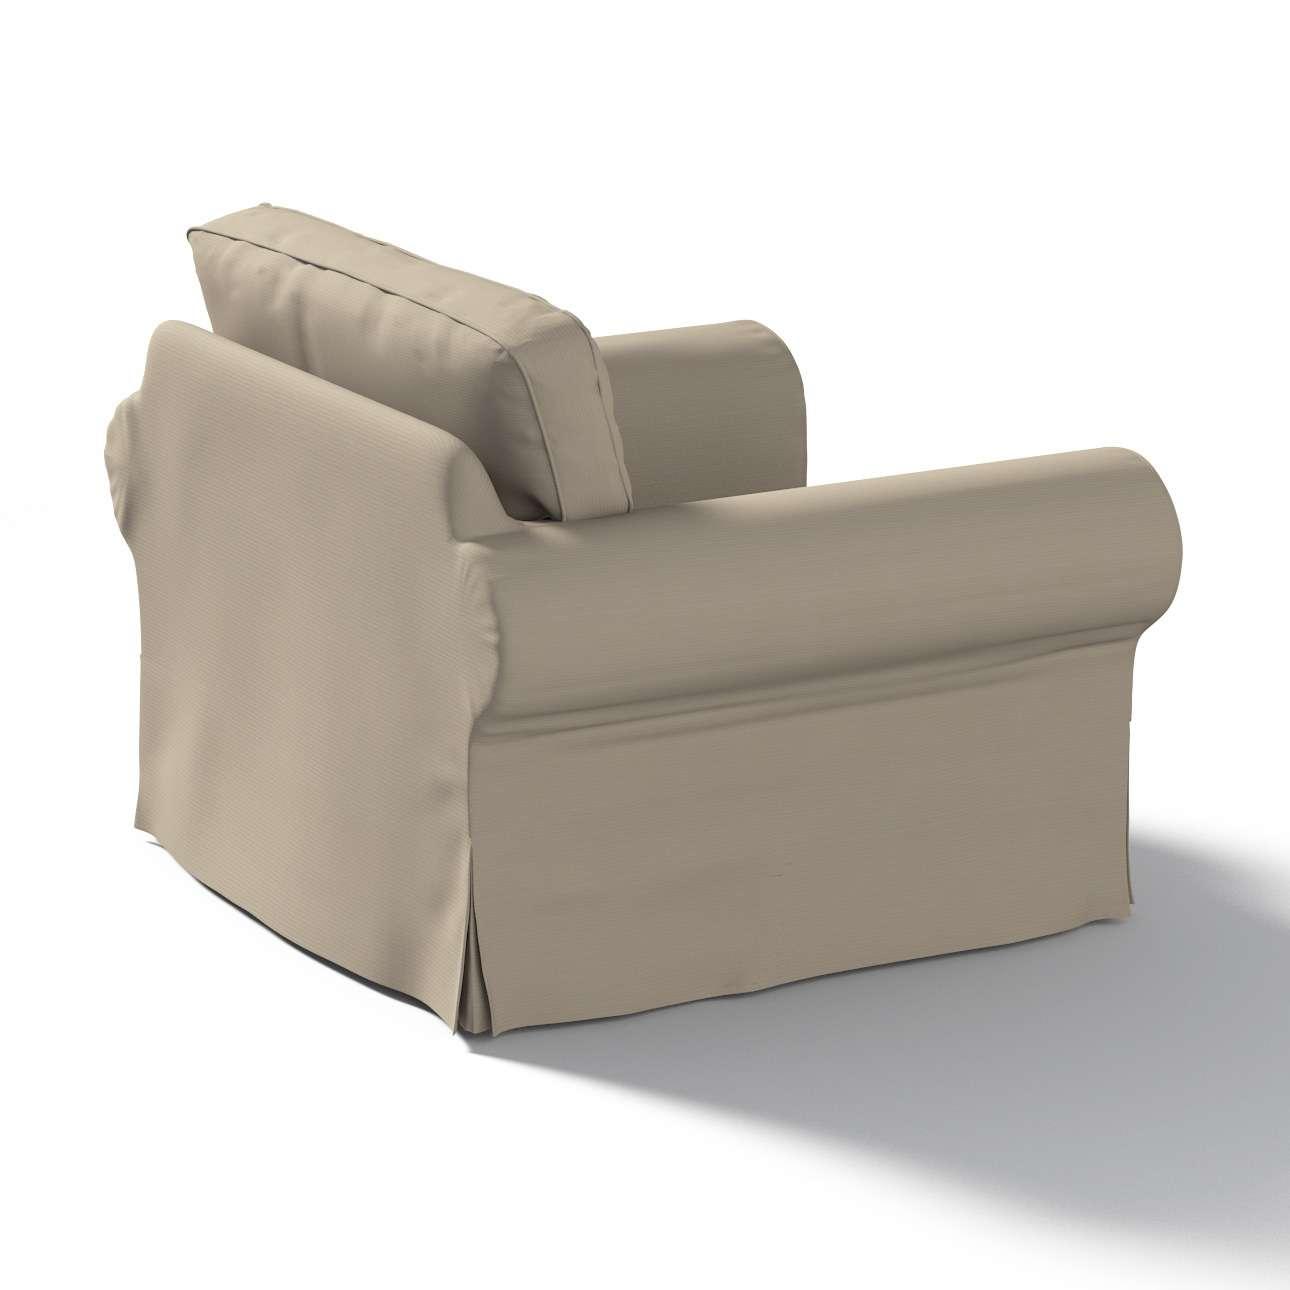 Ektorp Sesselbezug Sesselhusse, Ektorp Sessel von der Kollektion Cotton Panama, Stoff: 702-28